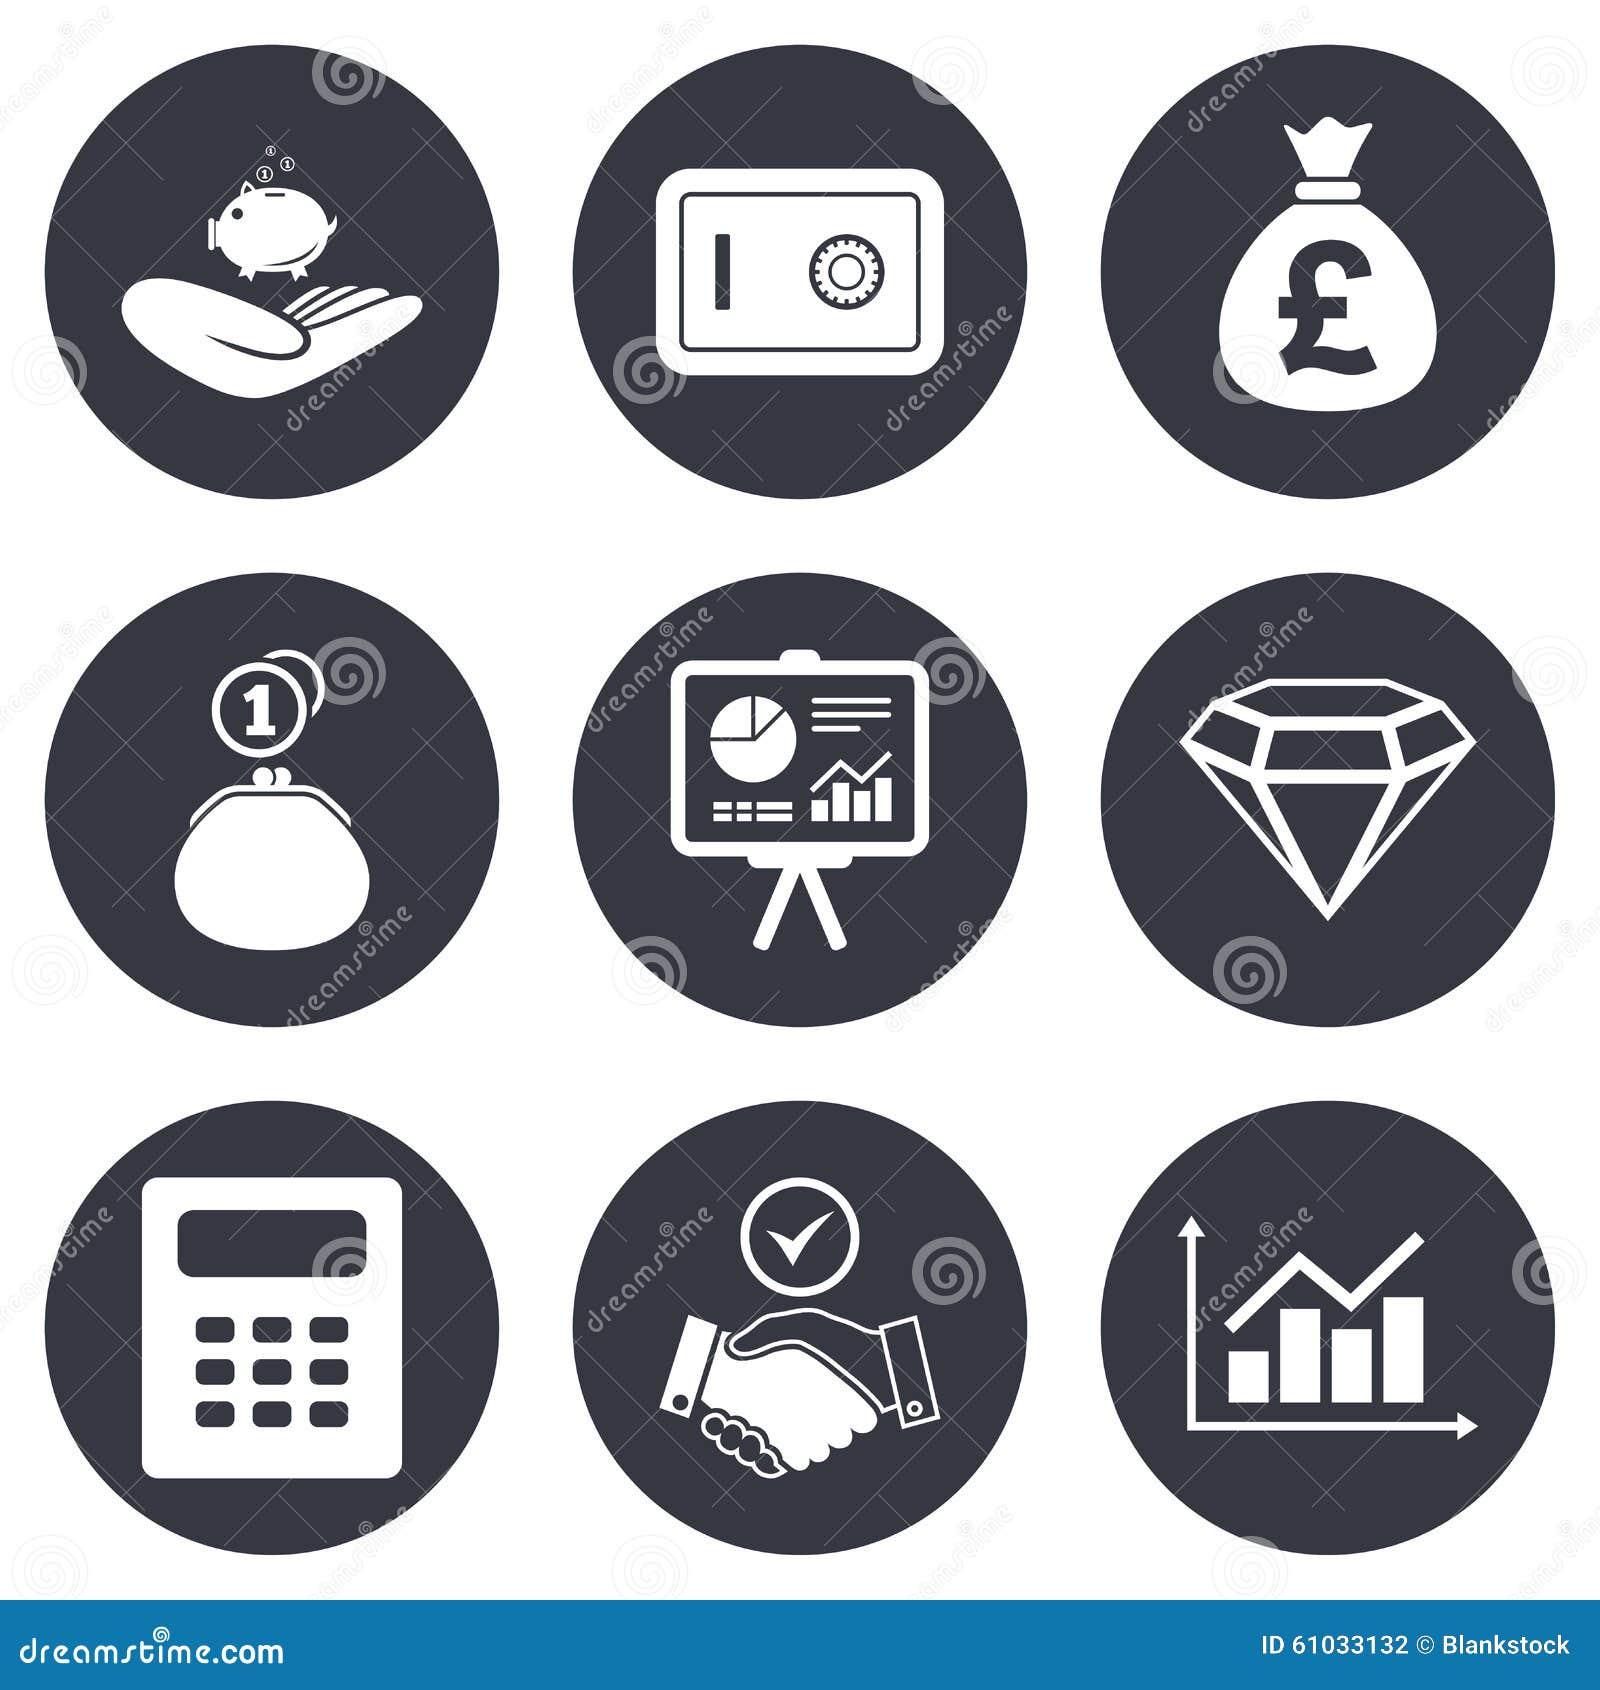 Money cash and finance icons handshake sign stock vector money cash and finance icons handshake sign buycottarizona